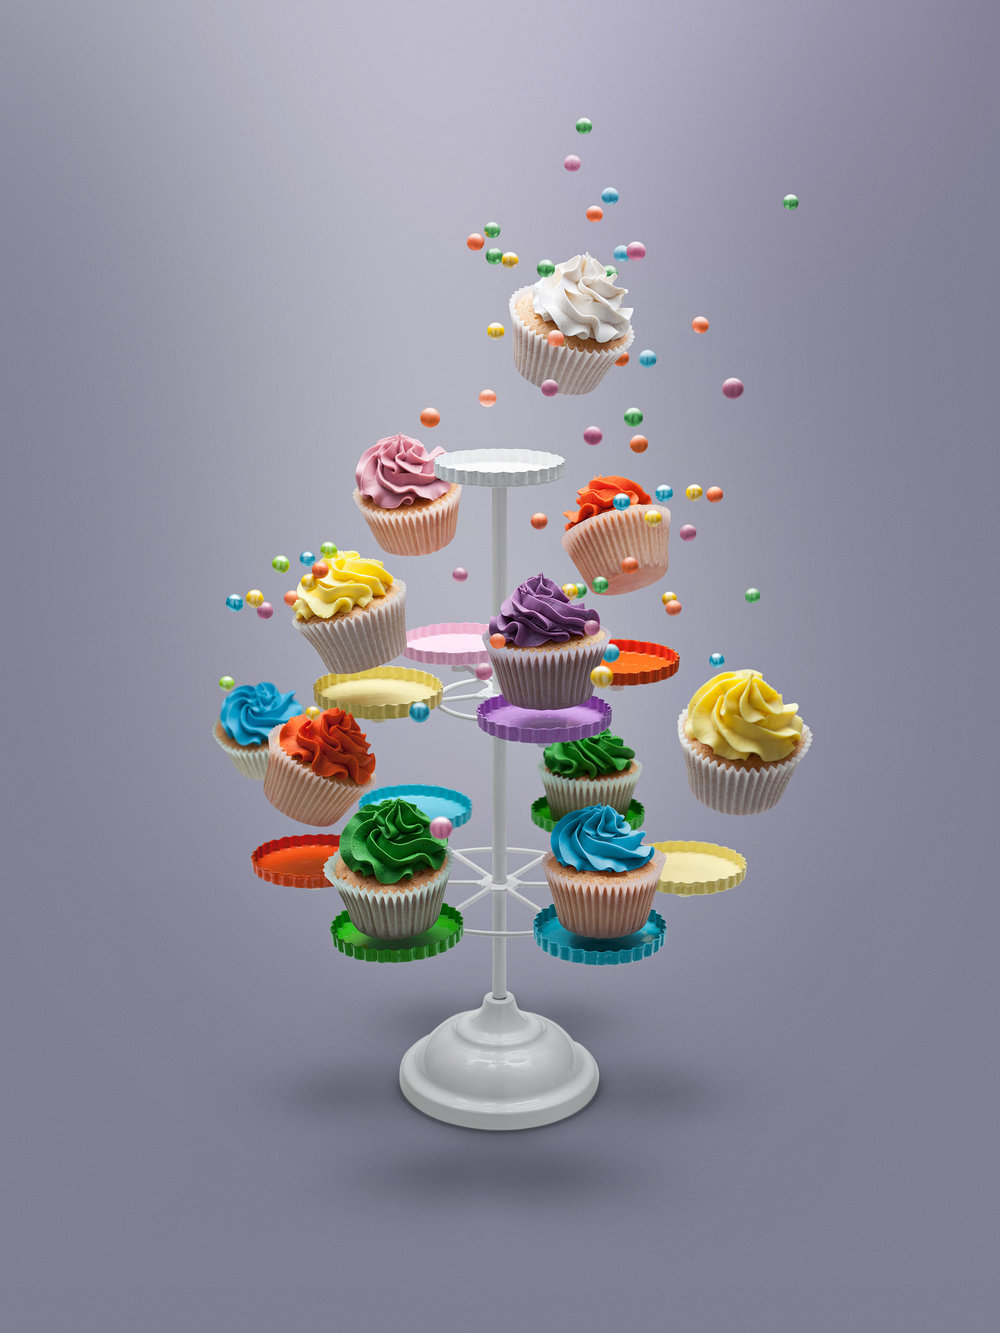 robvanderplank-cupcake-nc-test-pf-v1.jpg